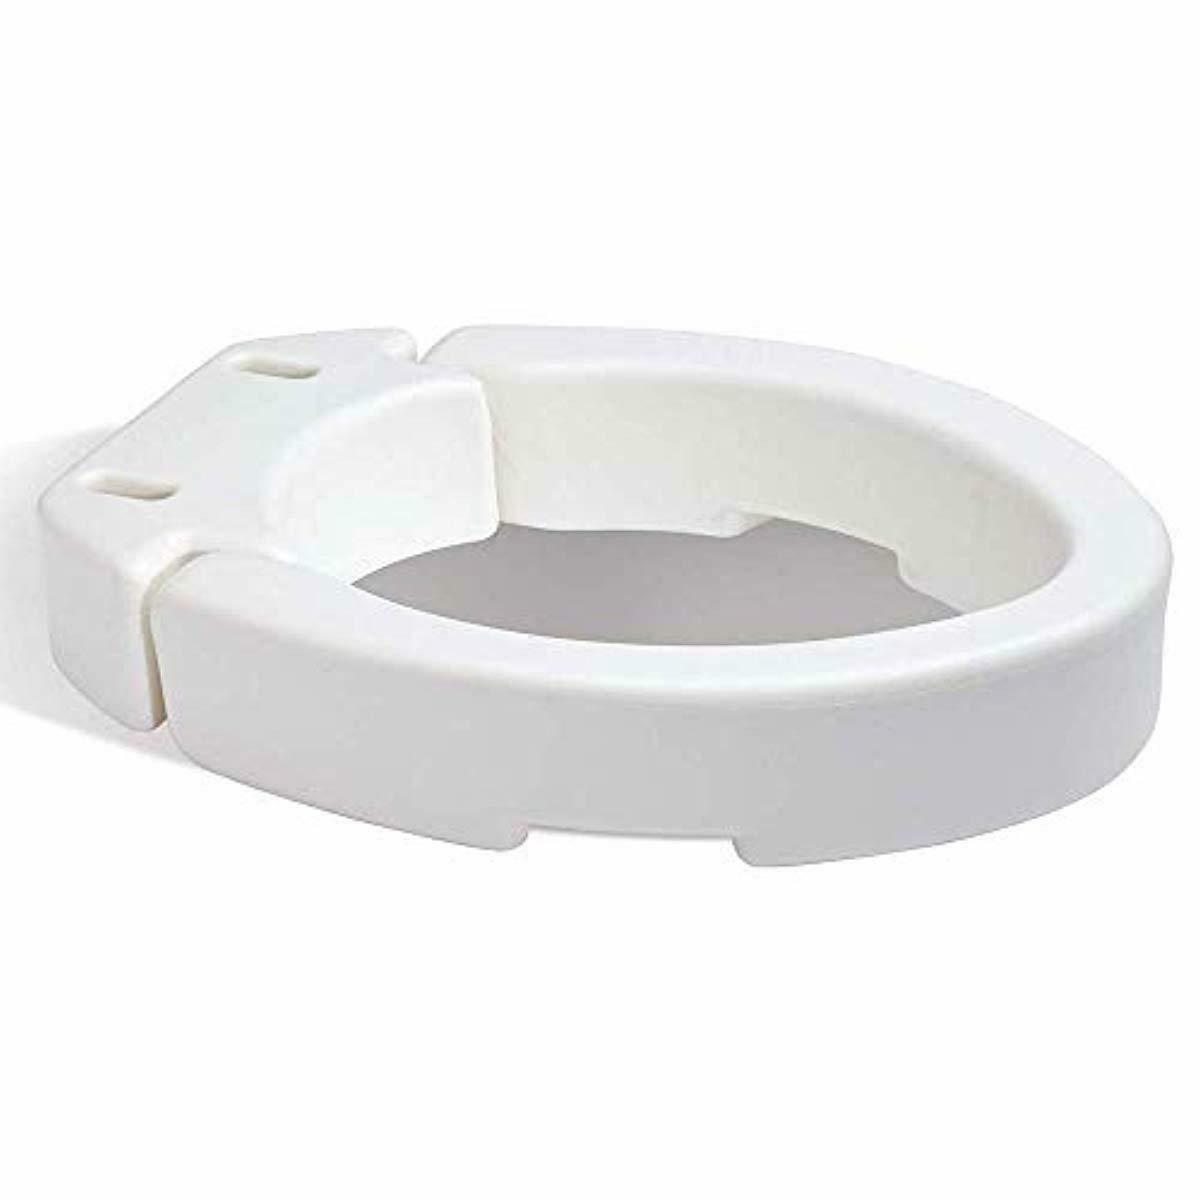 Carex Seat Riser - 3.5 of Toilet Lift,